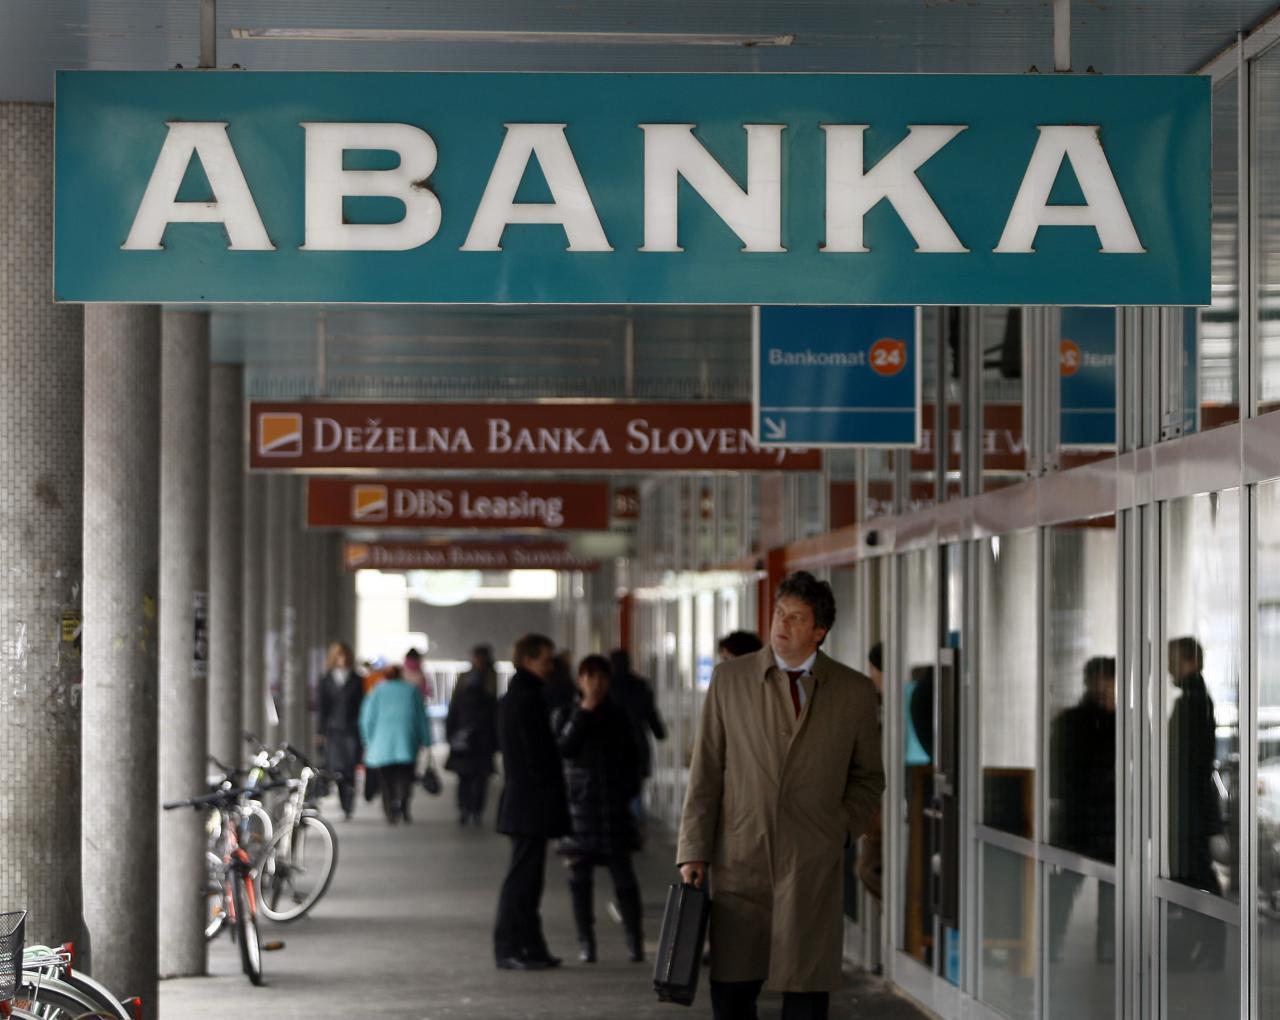 Slovenian Abanka sells Aleasing subsidiary to Sparkasse